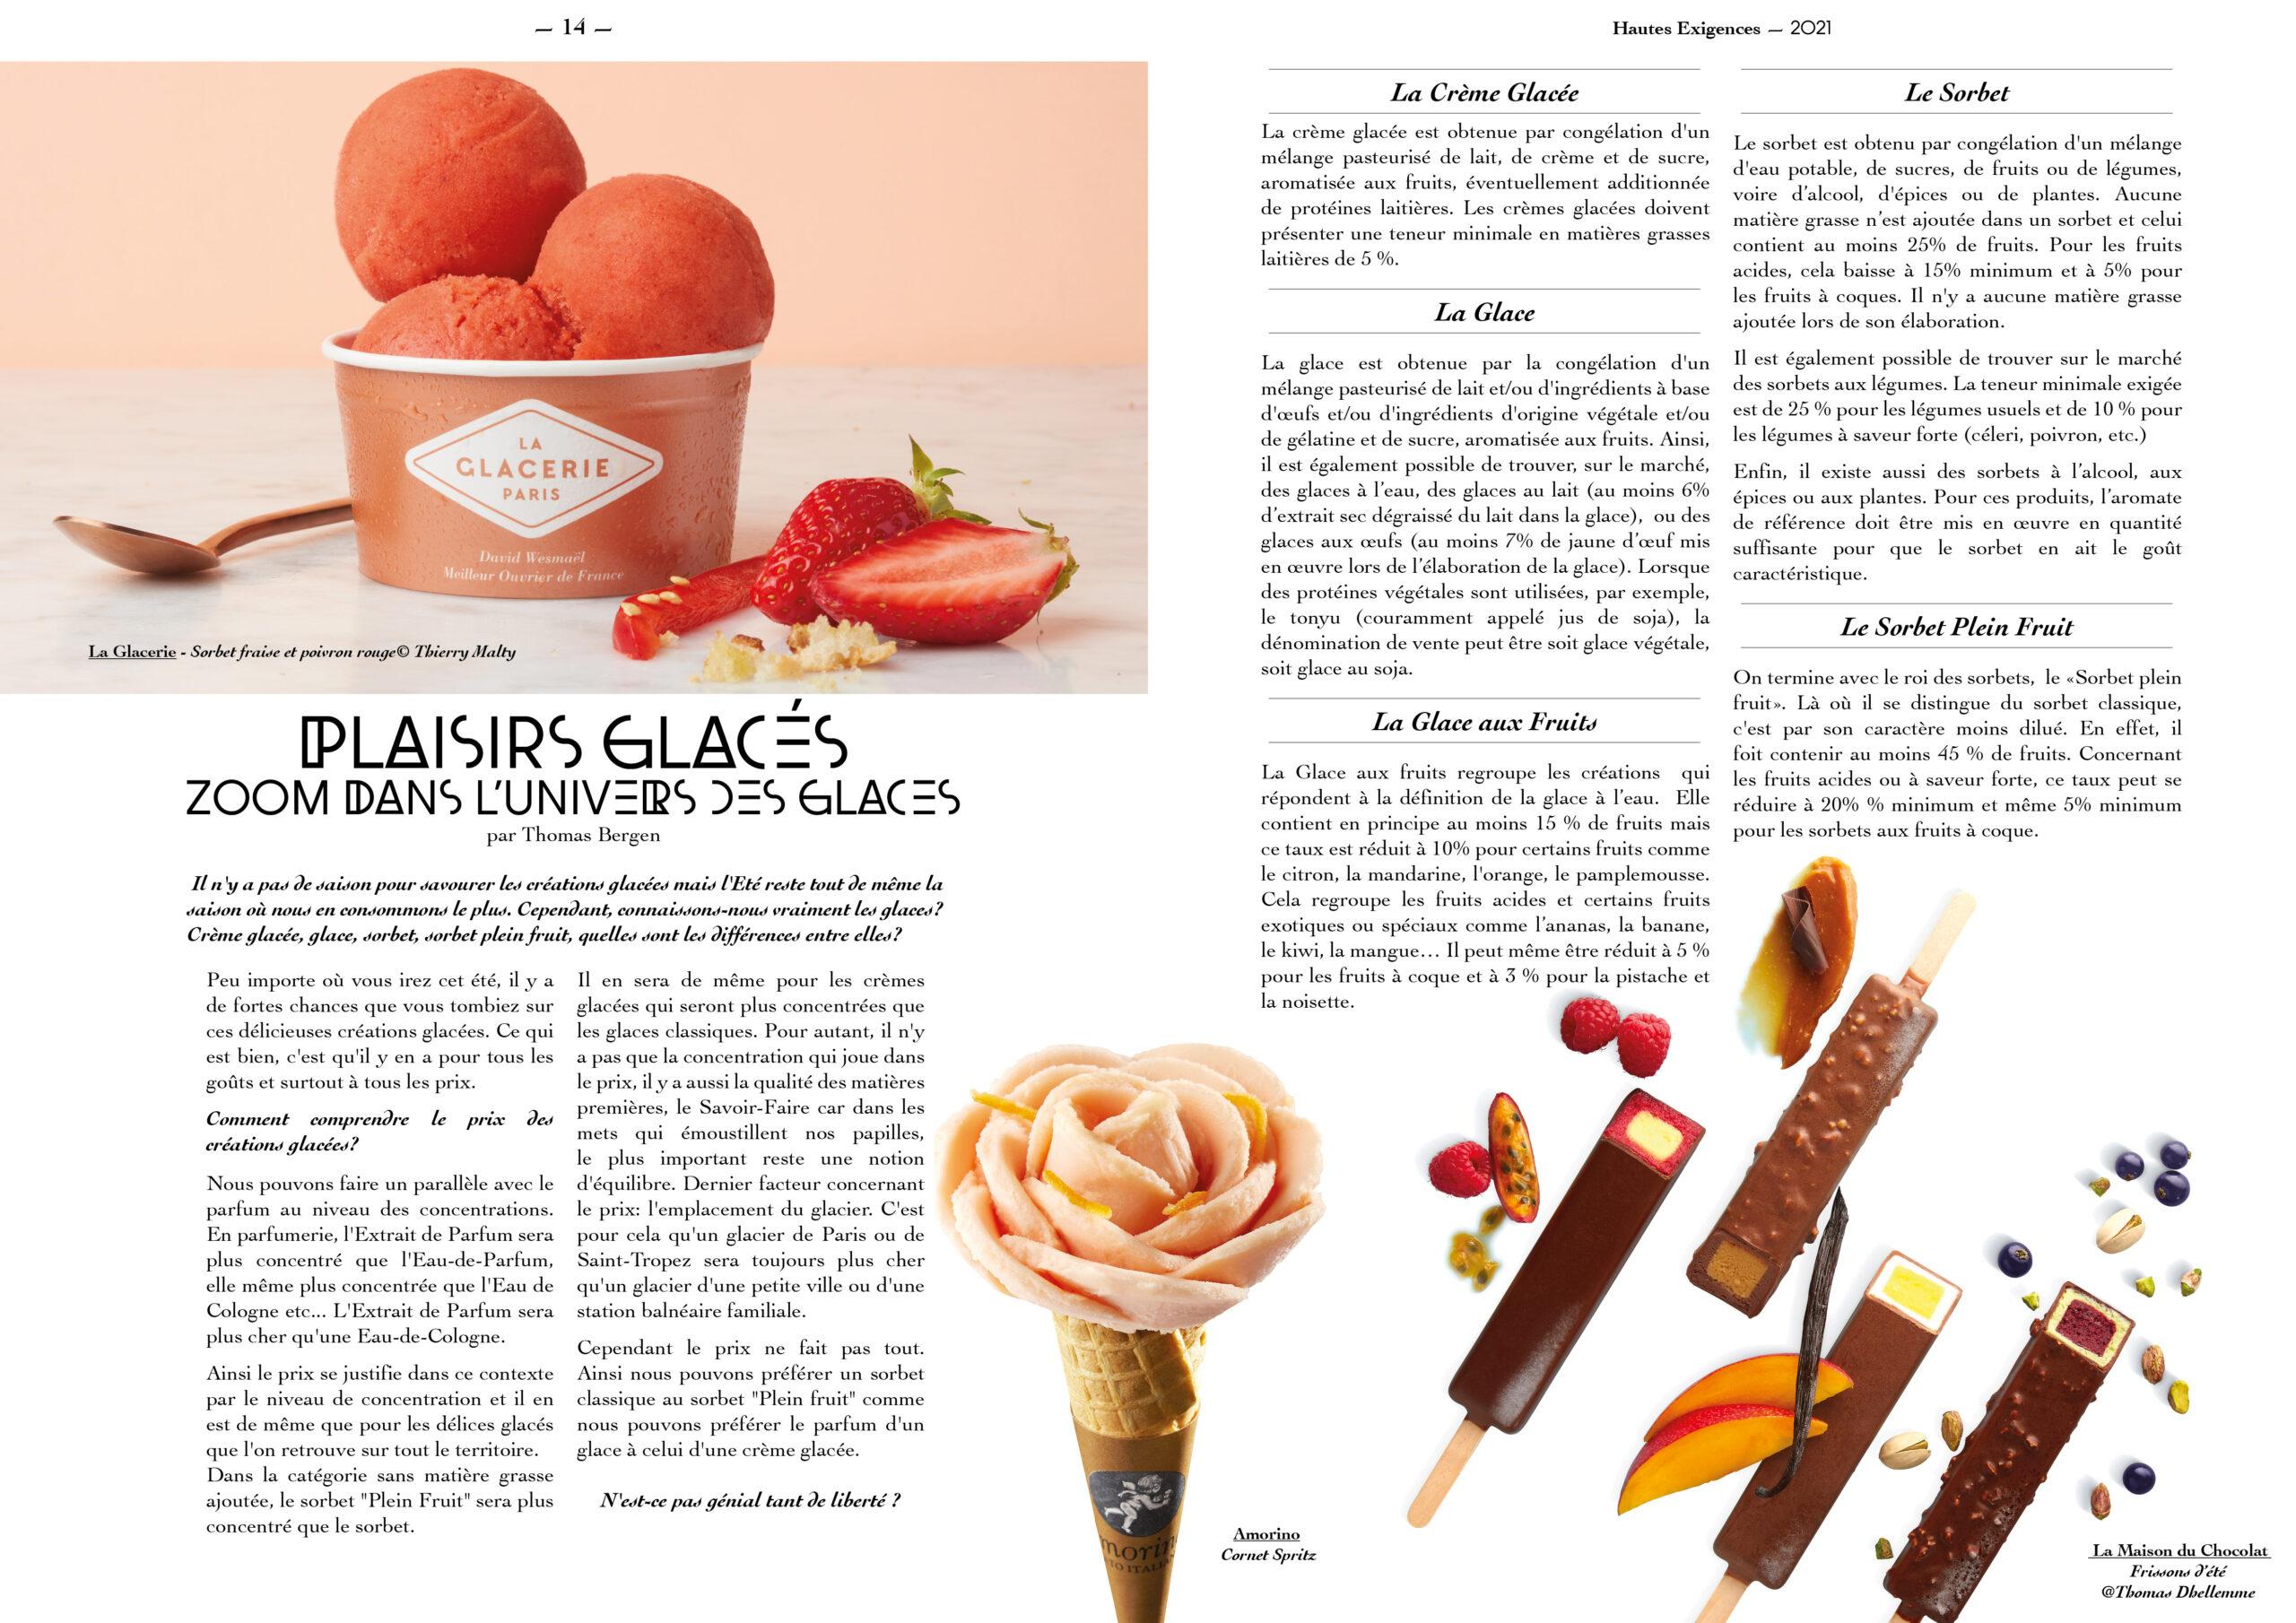 Hautes Exigences Magazine Hors Serie 2021 page 14-15